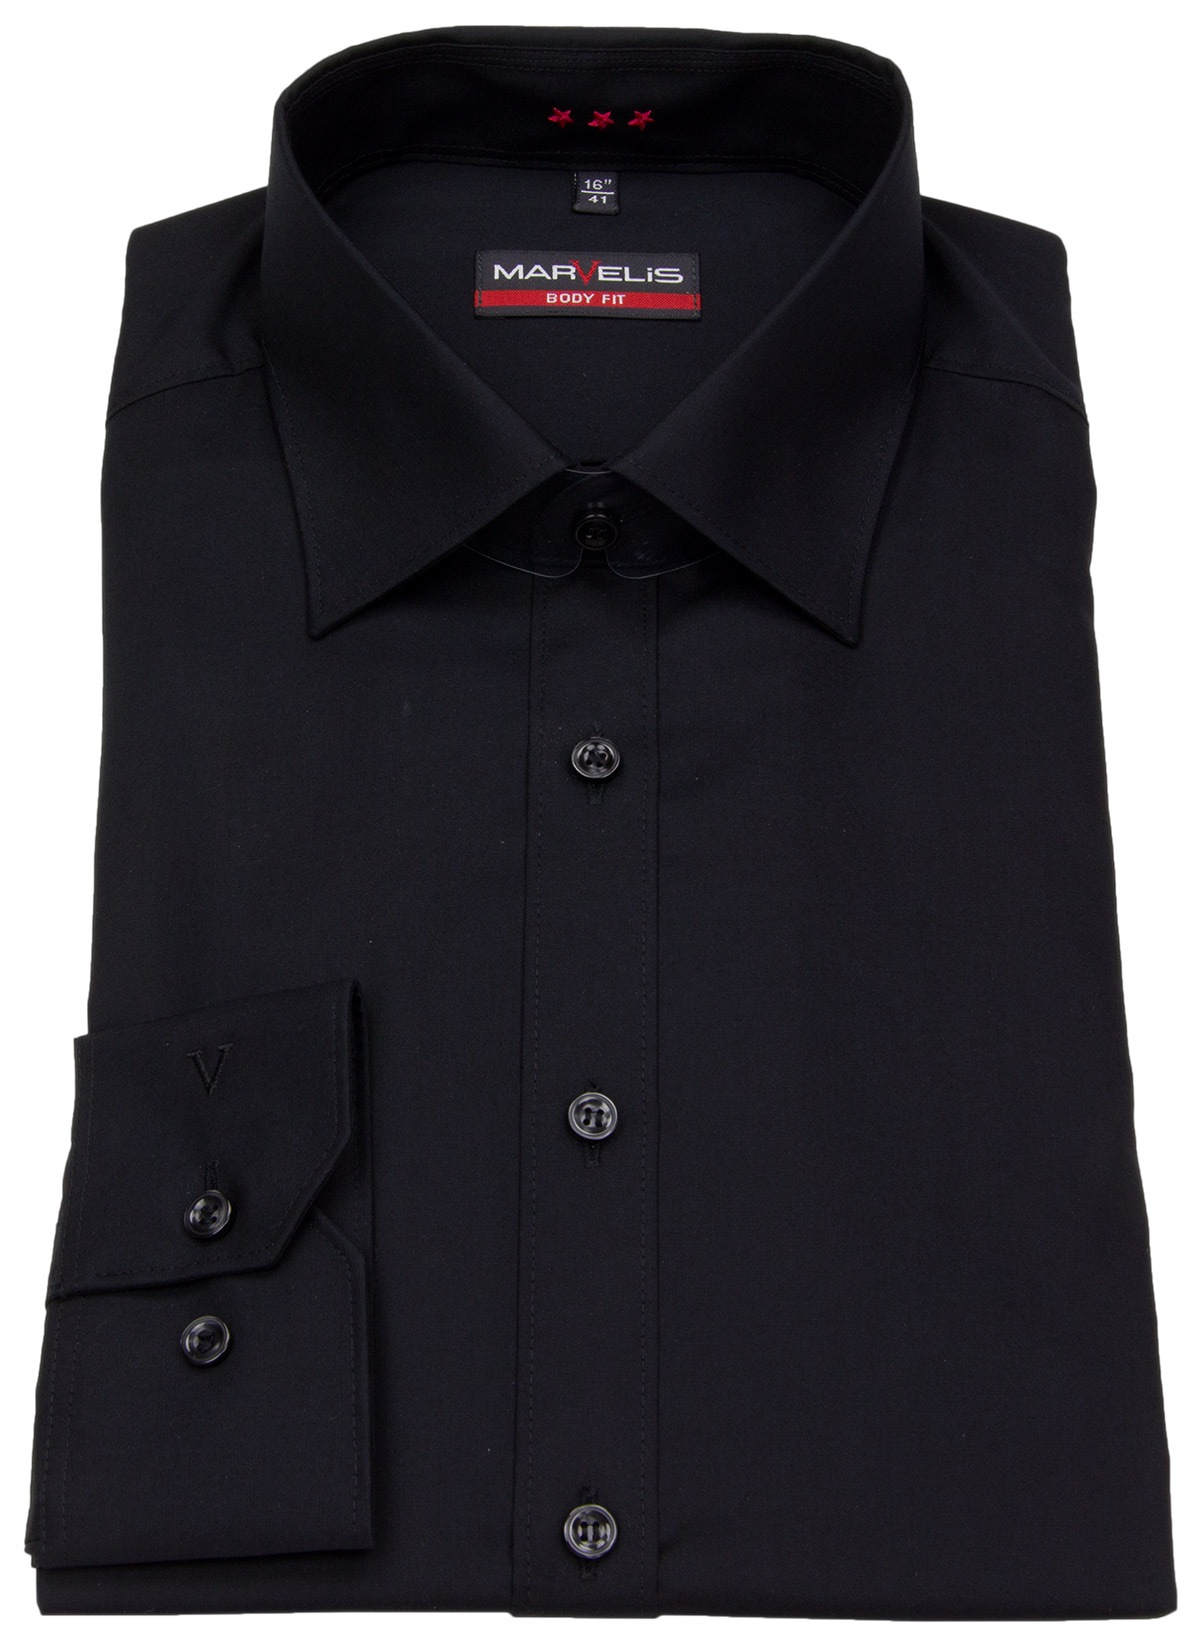 OLYMP Level Five body fit Hemd UNI POPELINE rot mit New York Kent Kragen in schmaler Schnittform